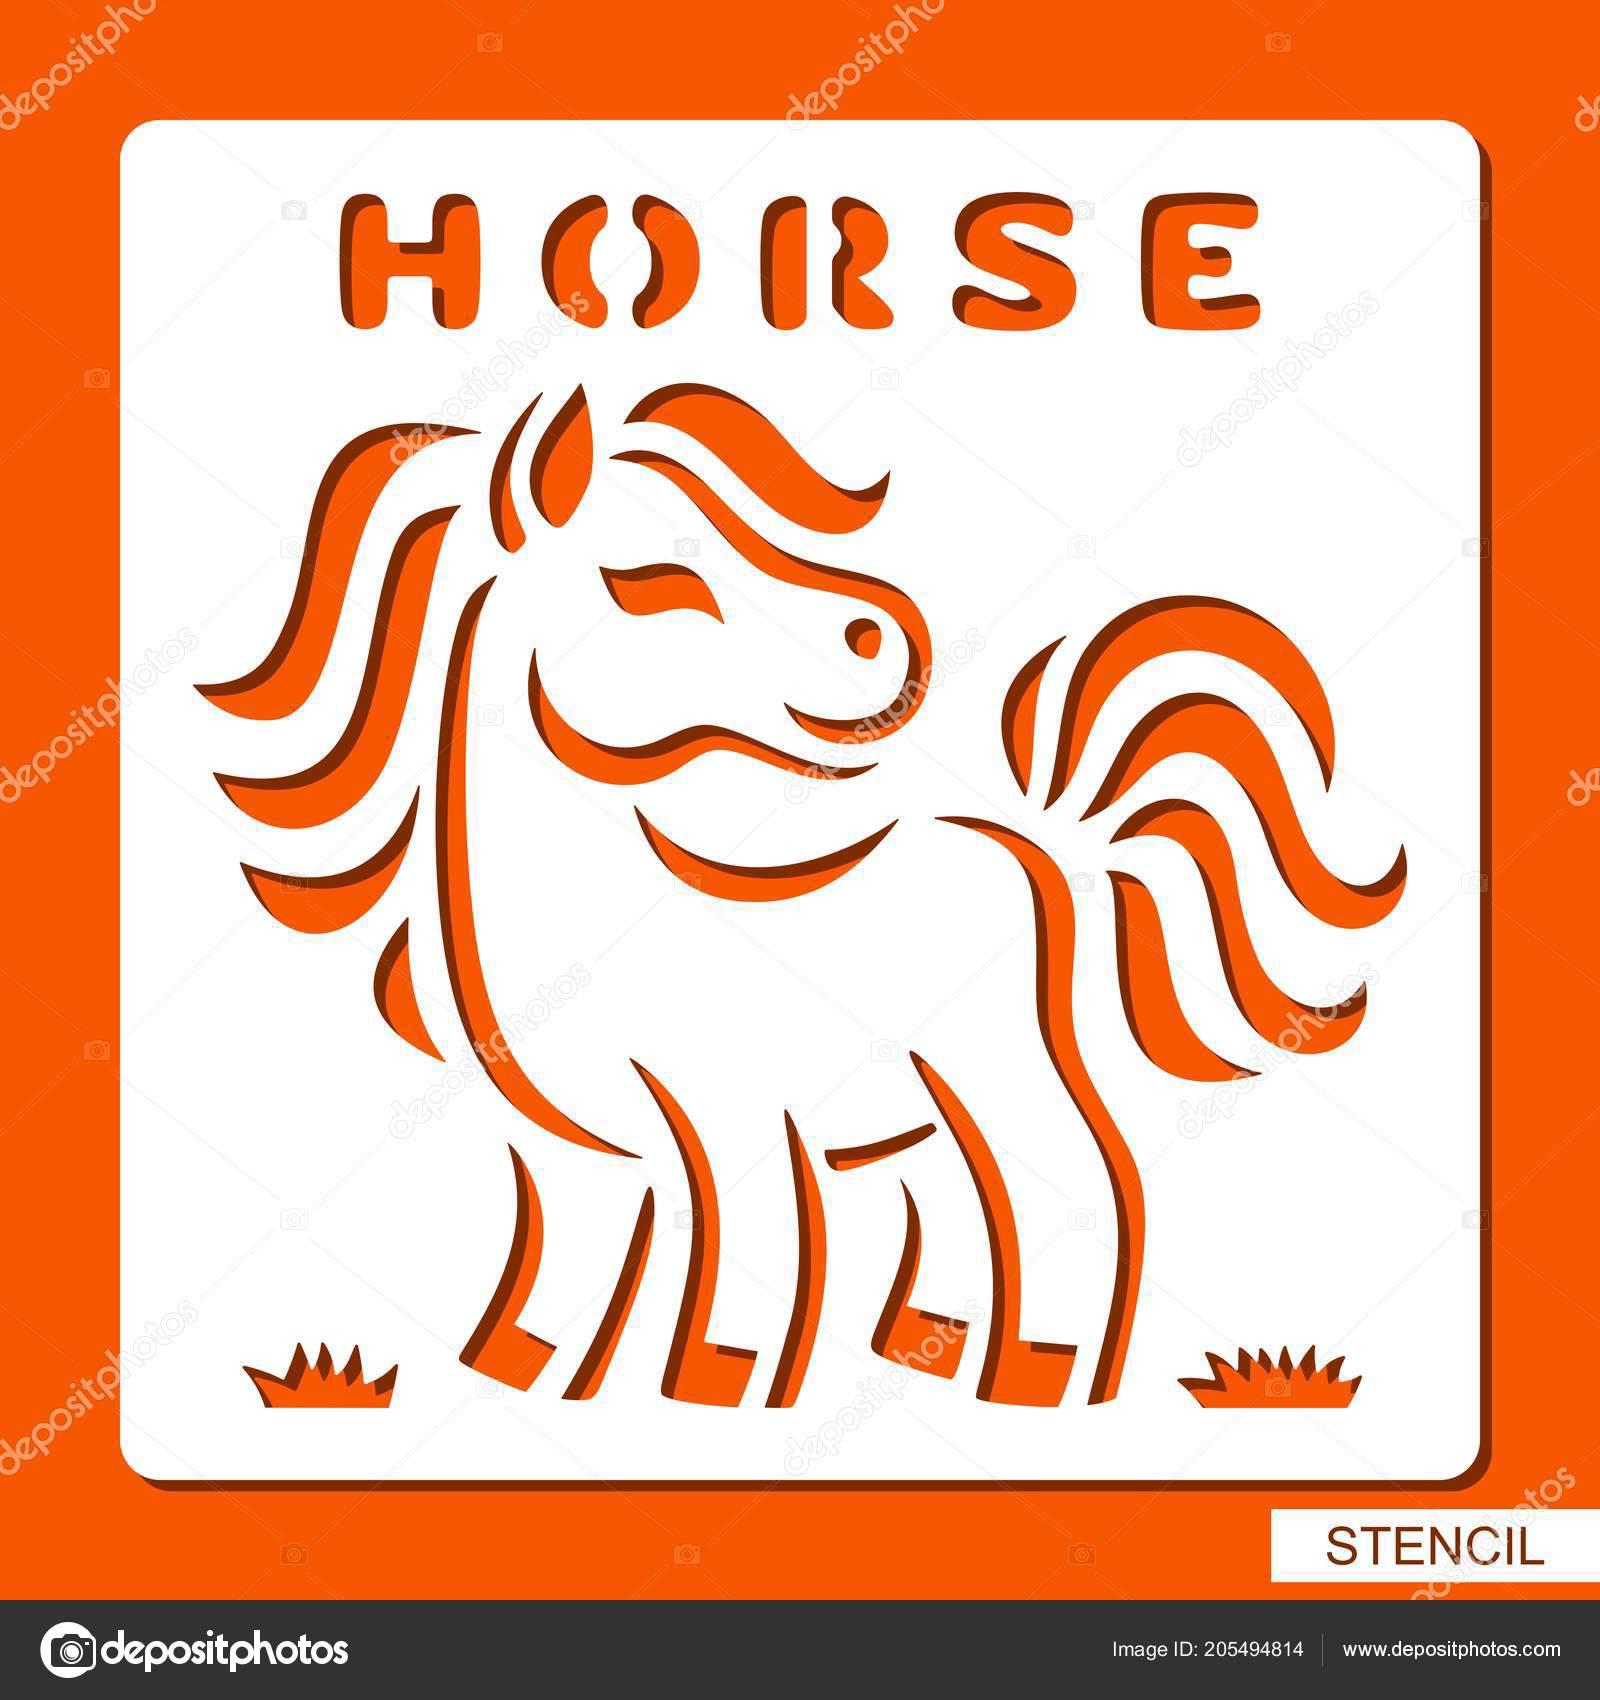 Stencil Children Horse Grass Template Laser Cutting Wood